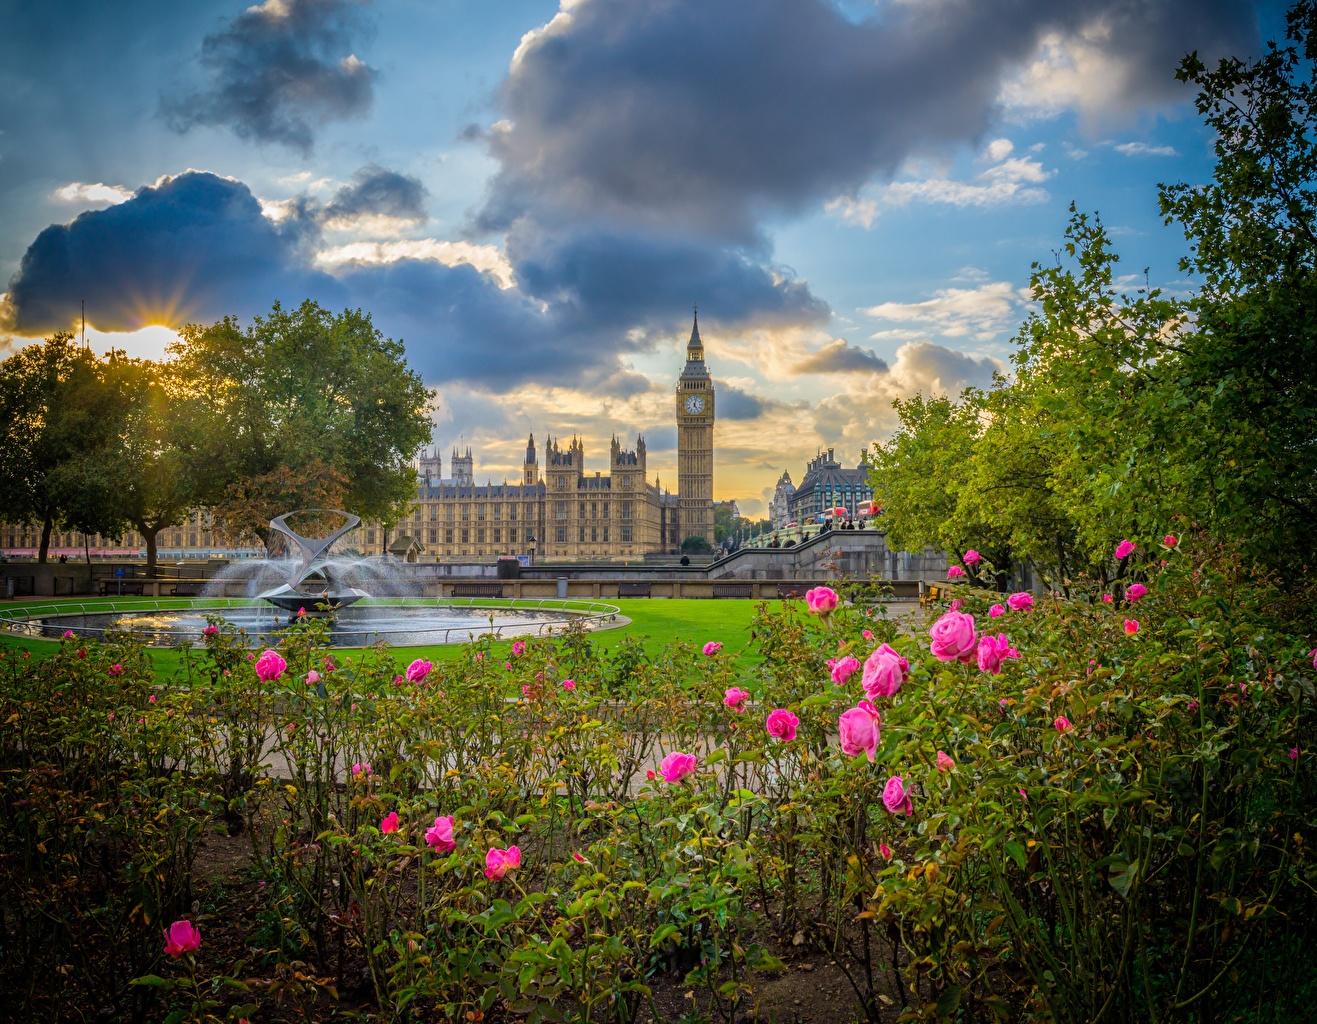 Обои для рабочего стола Лондон Биг-Бен Англия Фонтаны Palace of Westminster парк город лондоне Парки Города